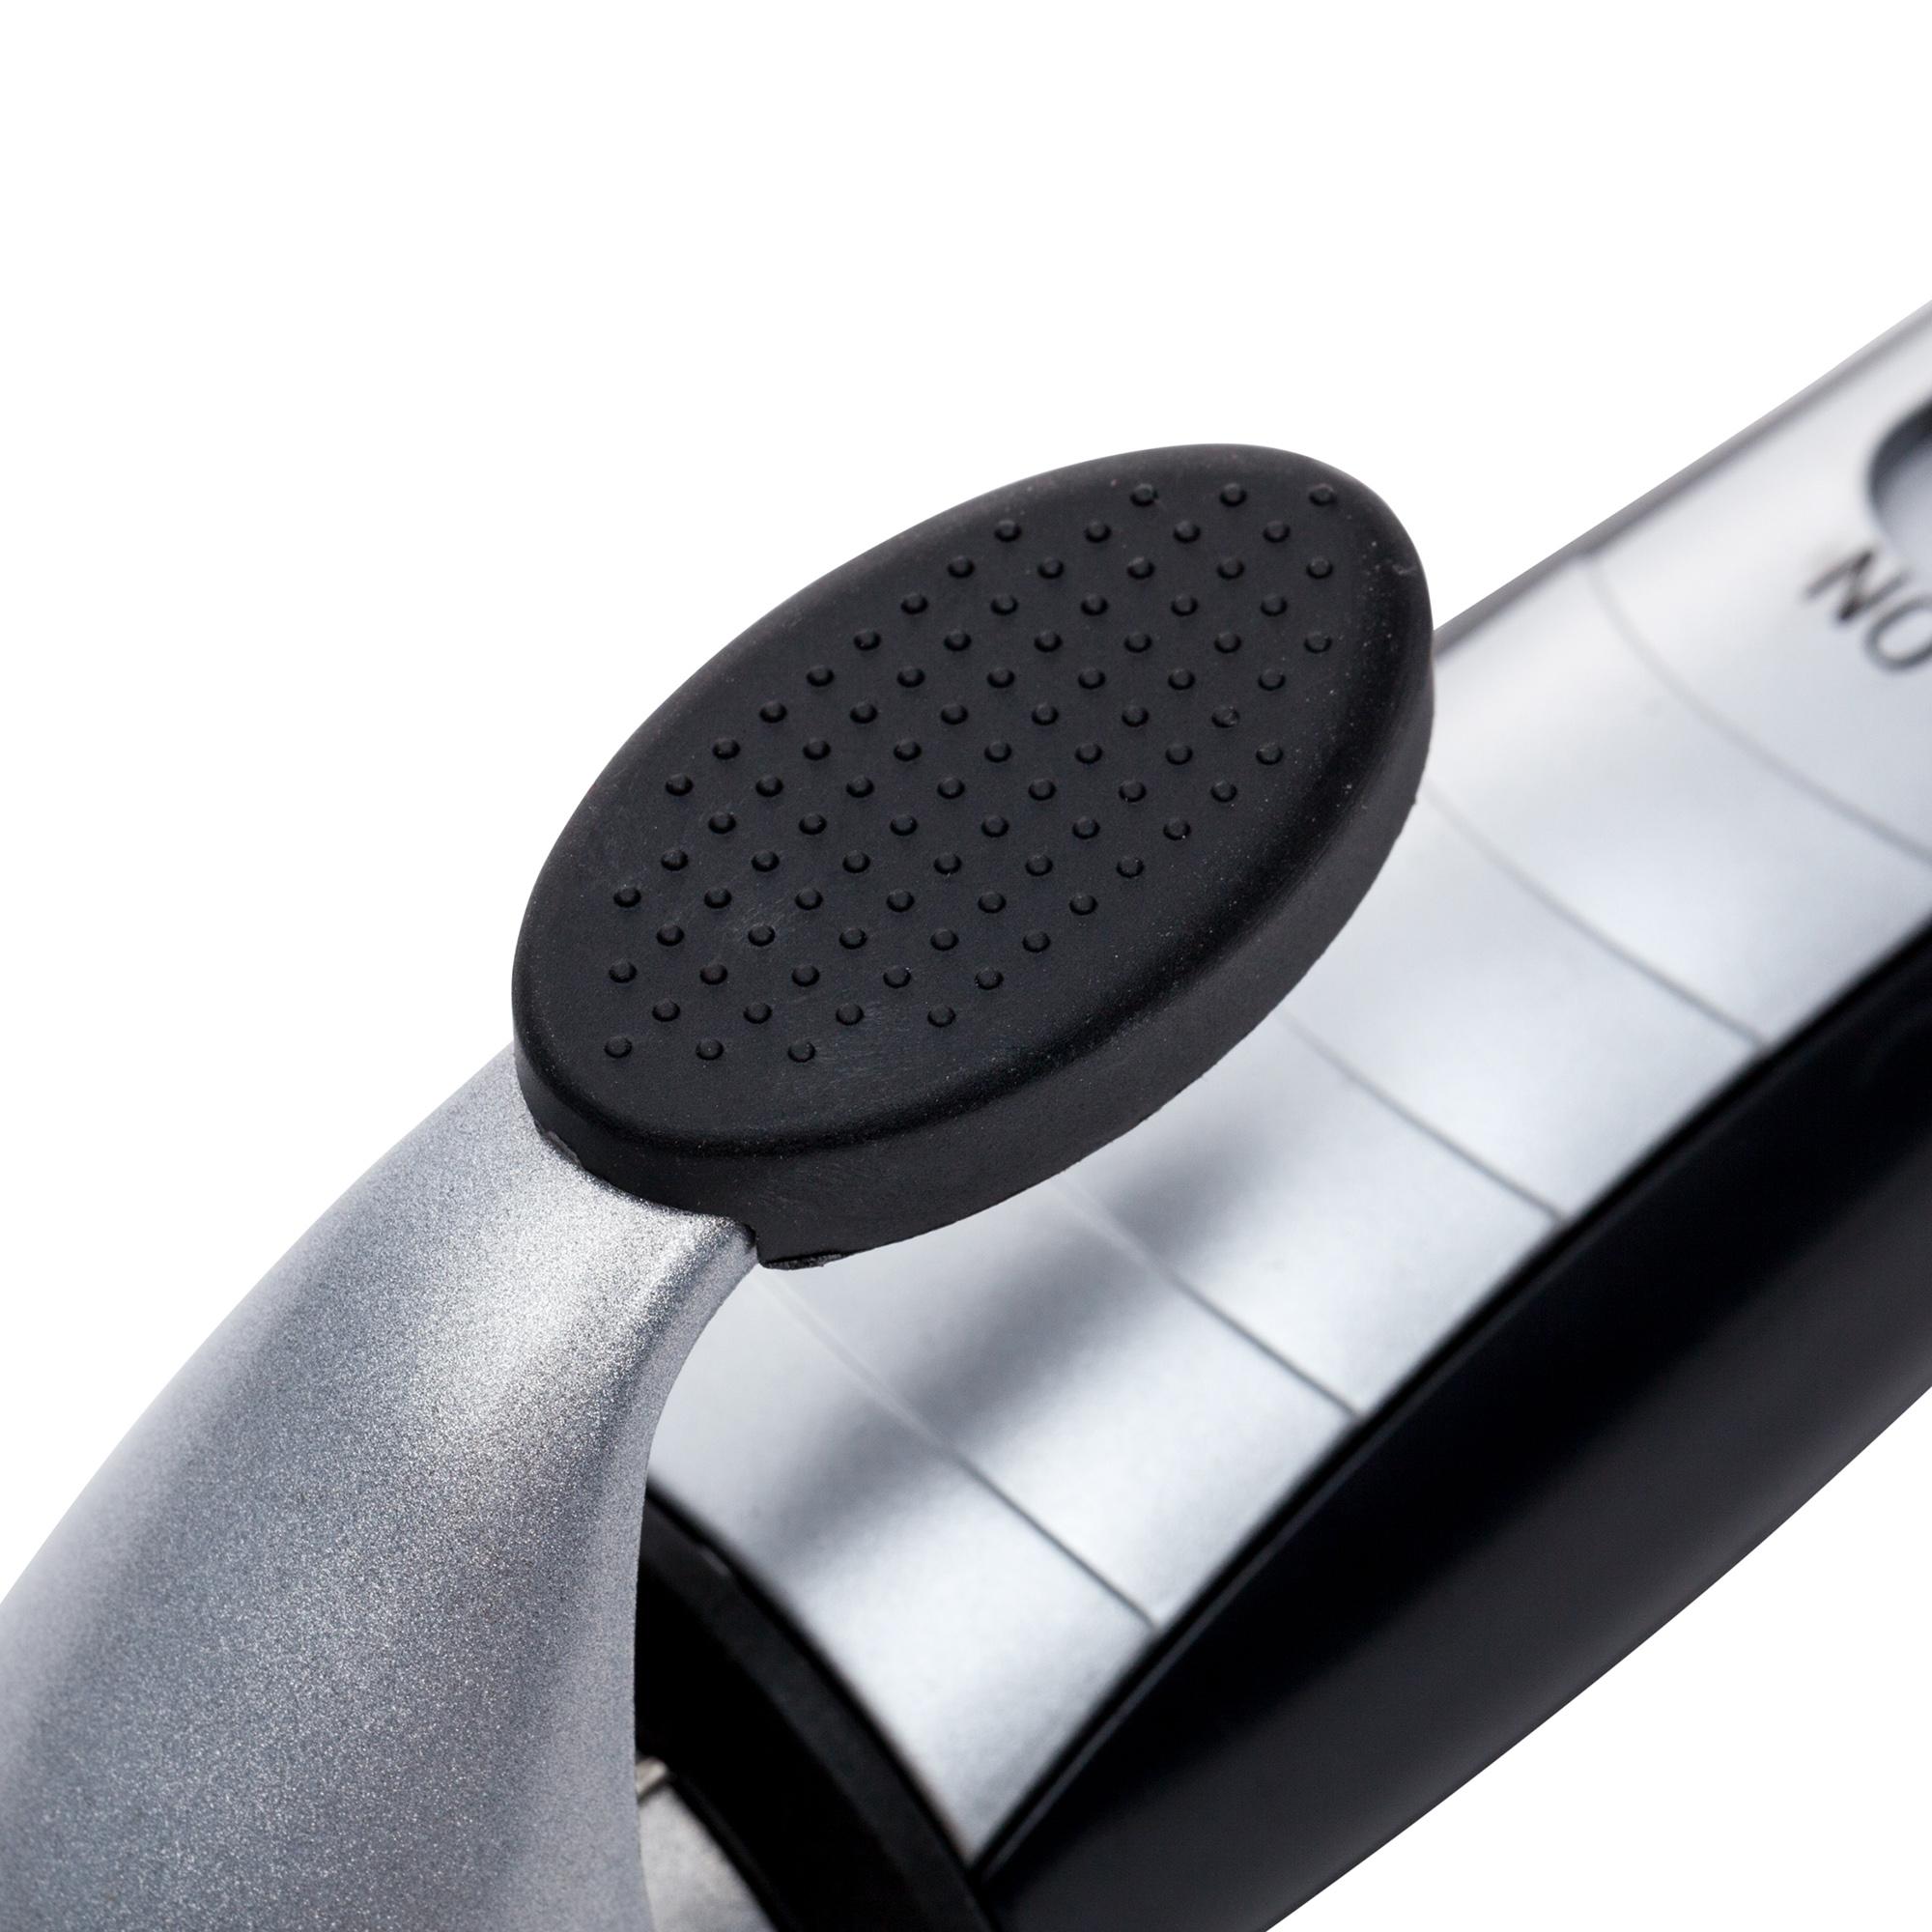 Adler AD2102 Rizador de Pelo Profesional de Cerámica, 25 mm, Calentamiento Rápido, punta aislada, 30 W